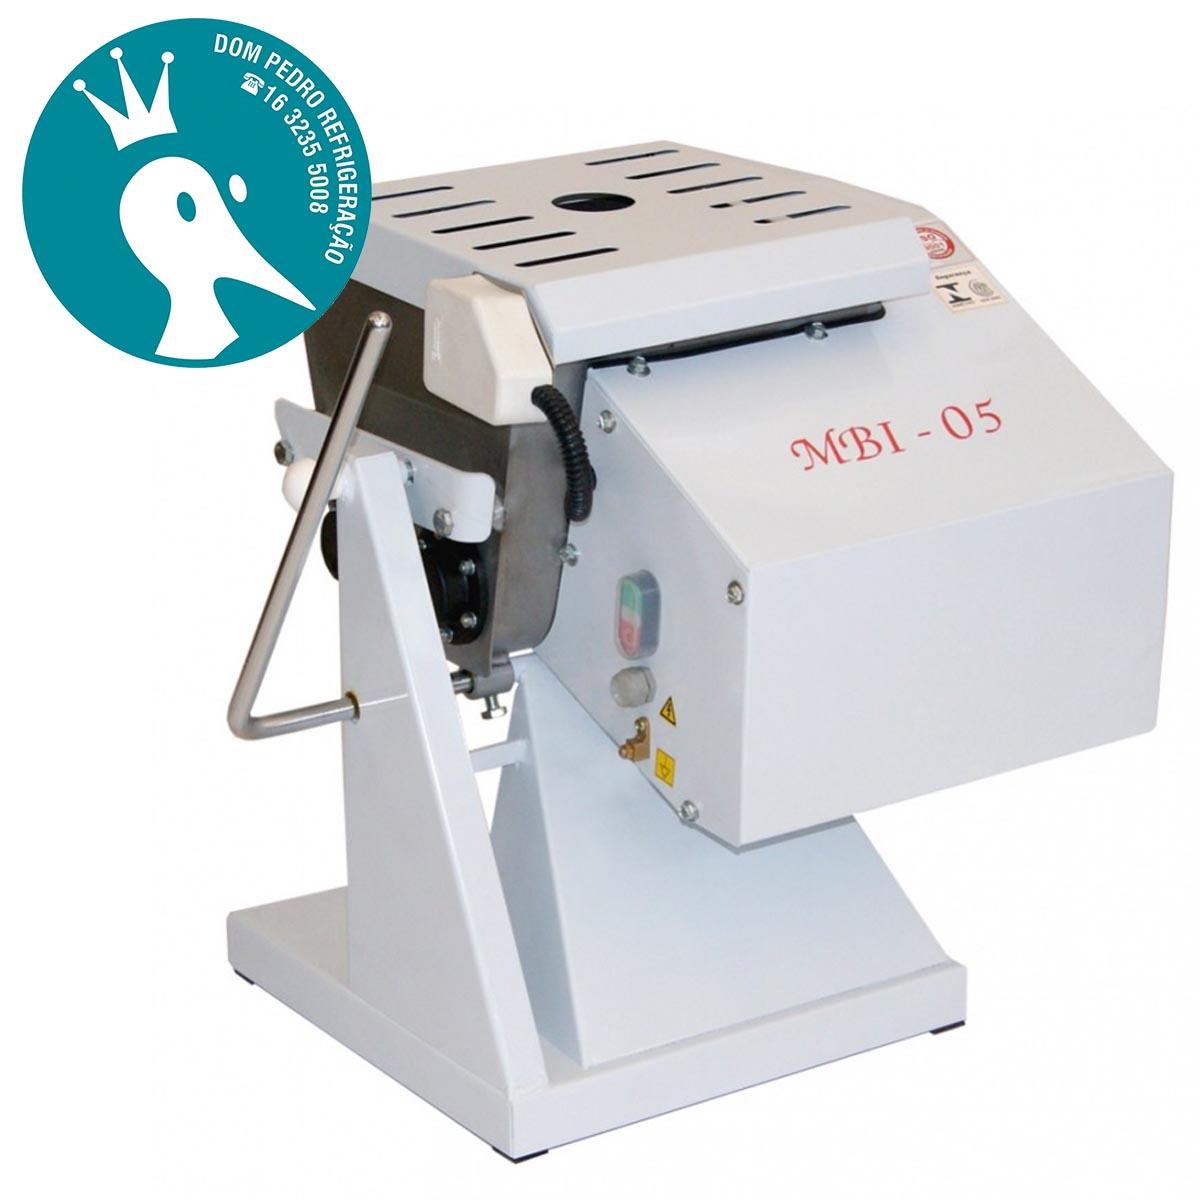 Amassadeira Semi-Rápida Basculante MBI-05 - Gastromaq - Bivolt